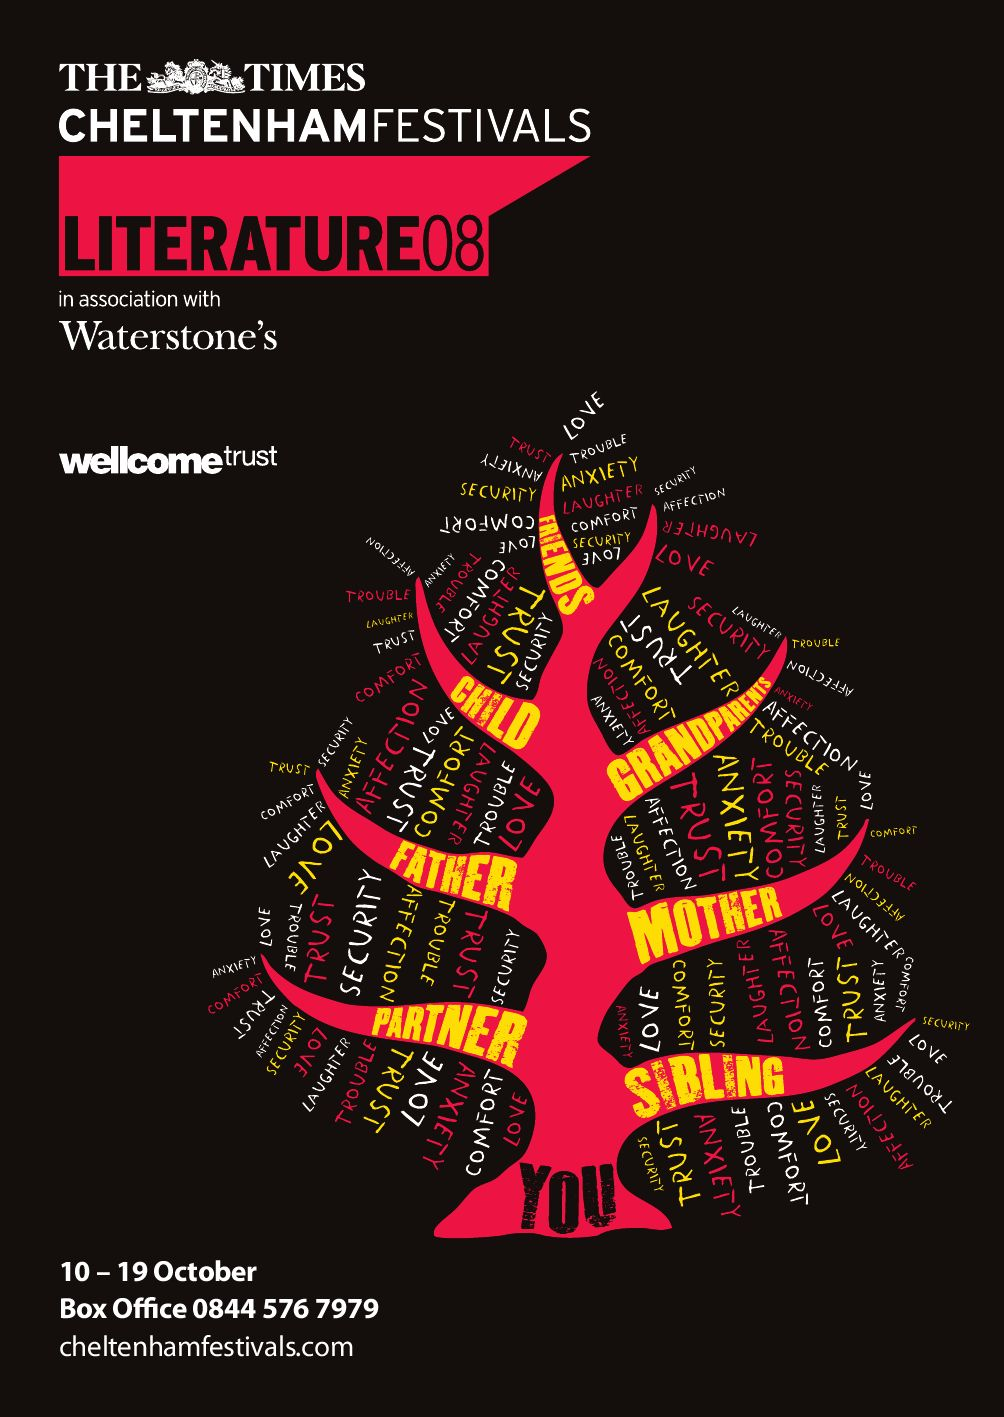 dfbc065ad2a Cheltenham Literature Festival brochure 2008 by Cheltenham Festivals - issuu